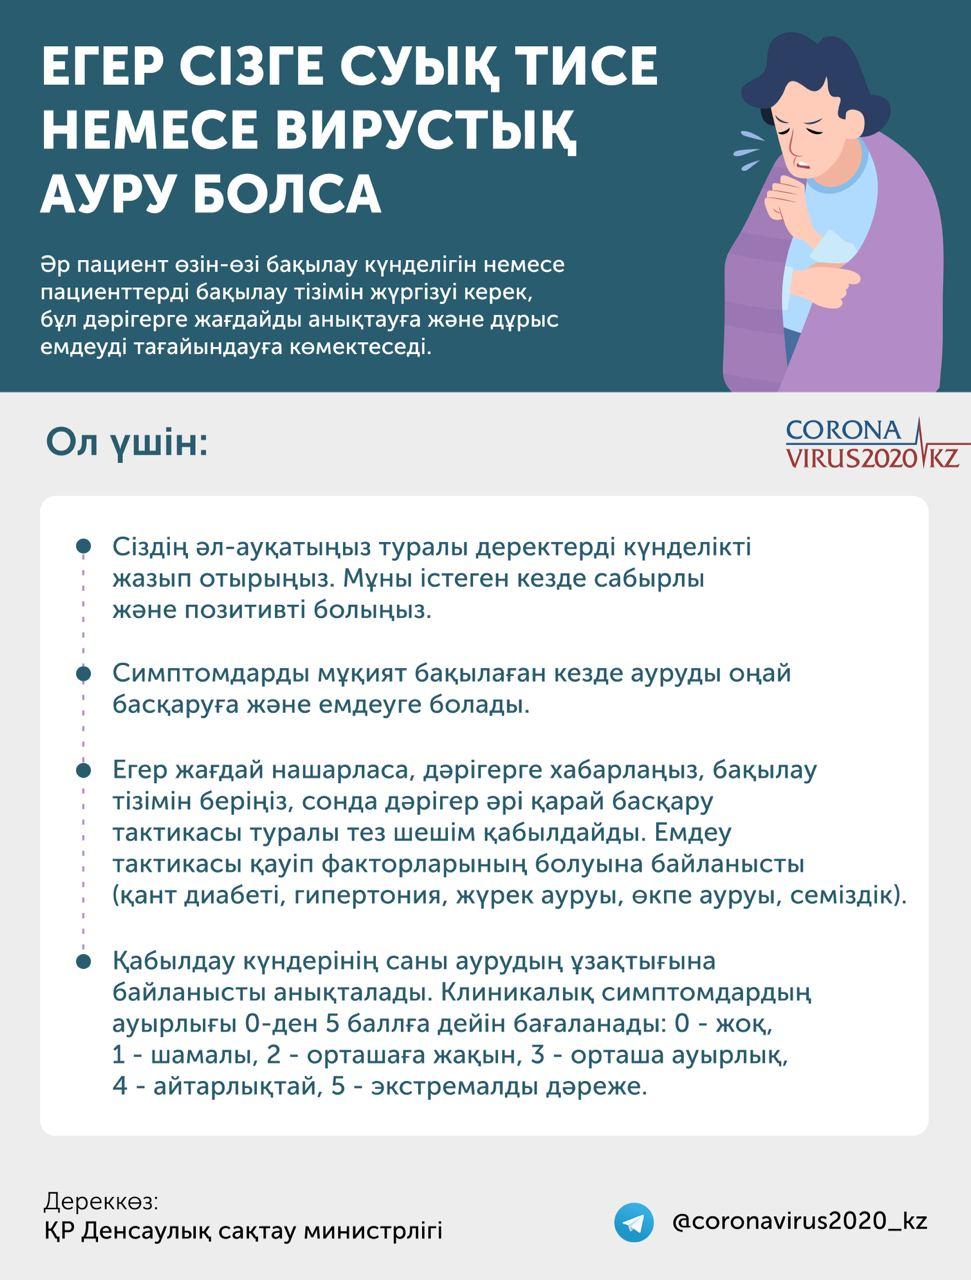 Whats-App-Image-2020-11-07-at-18-01-01-min